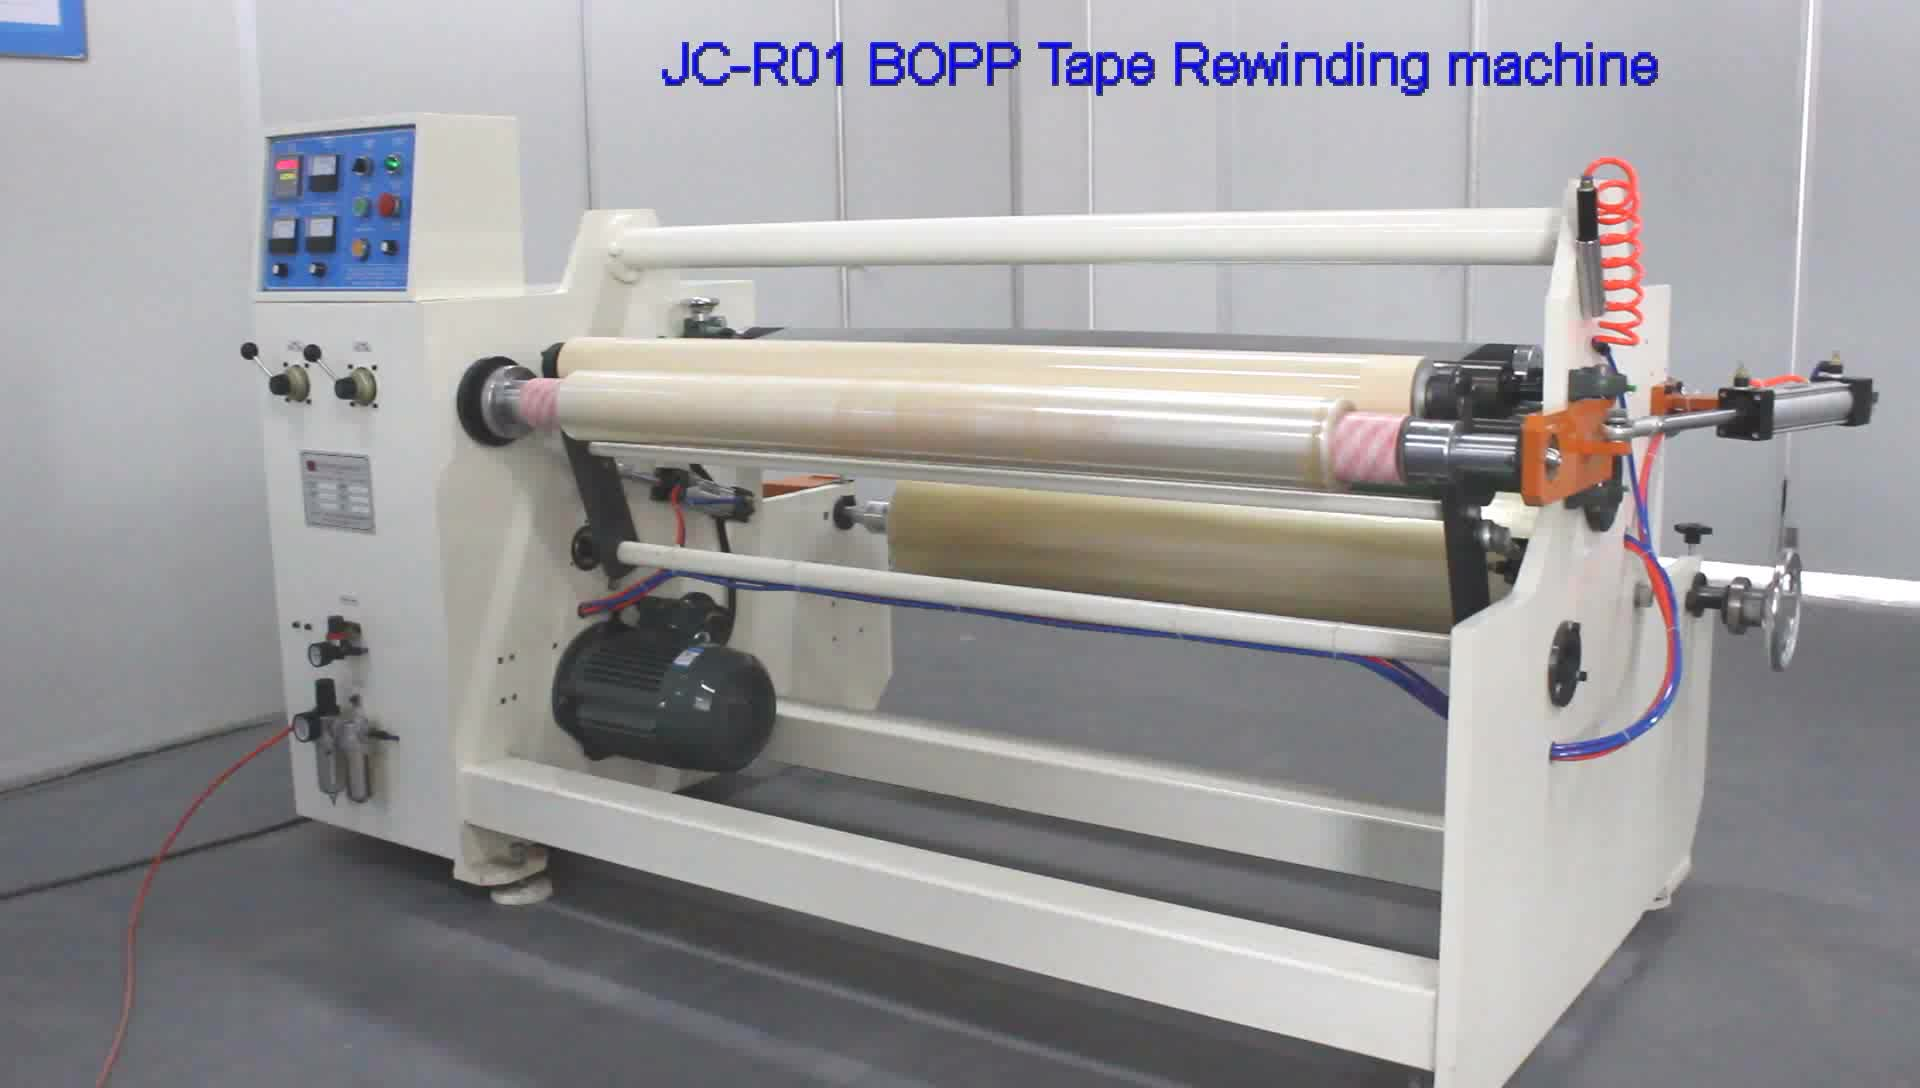 Big roll rewinding machine for adhesive tapes jumbo roll